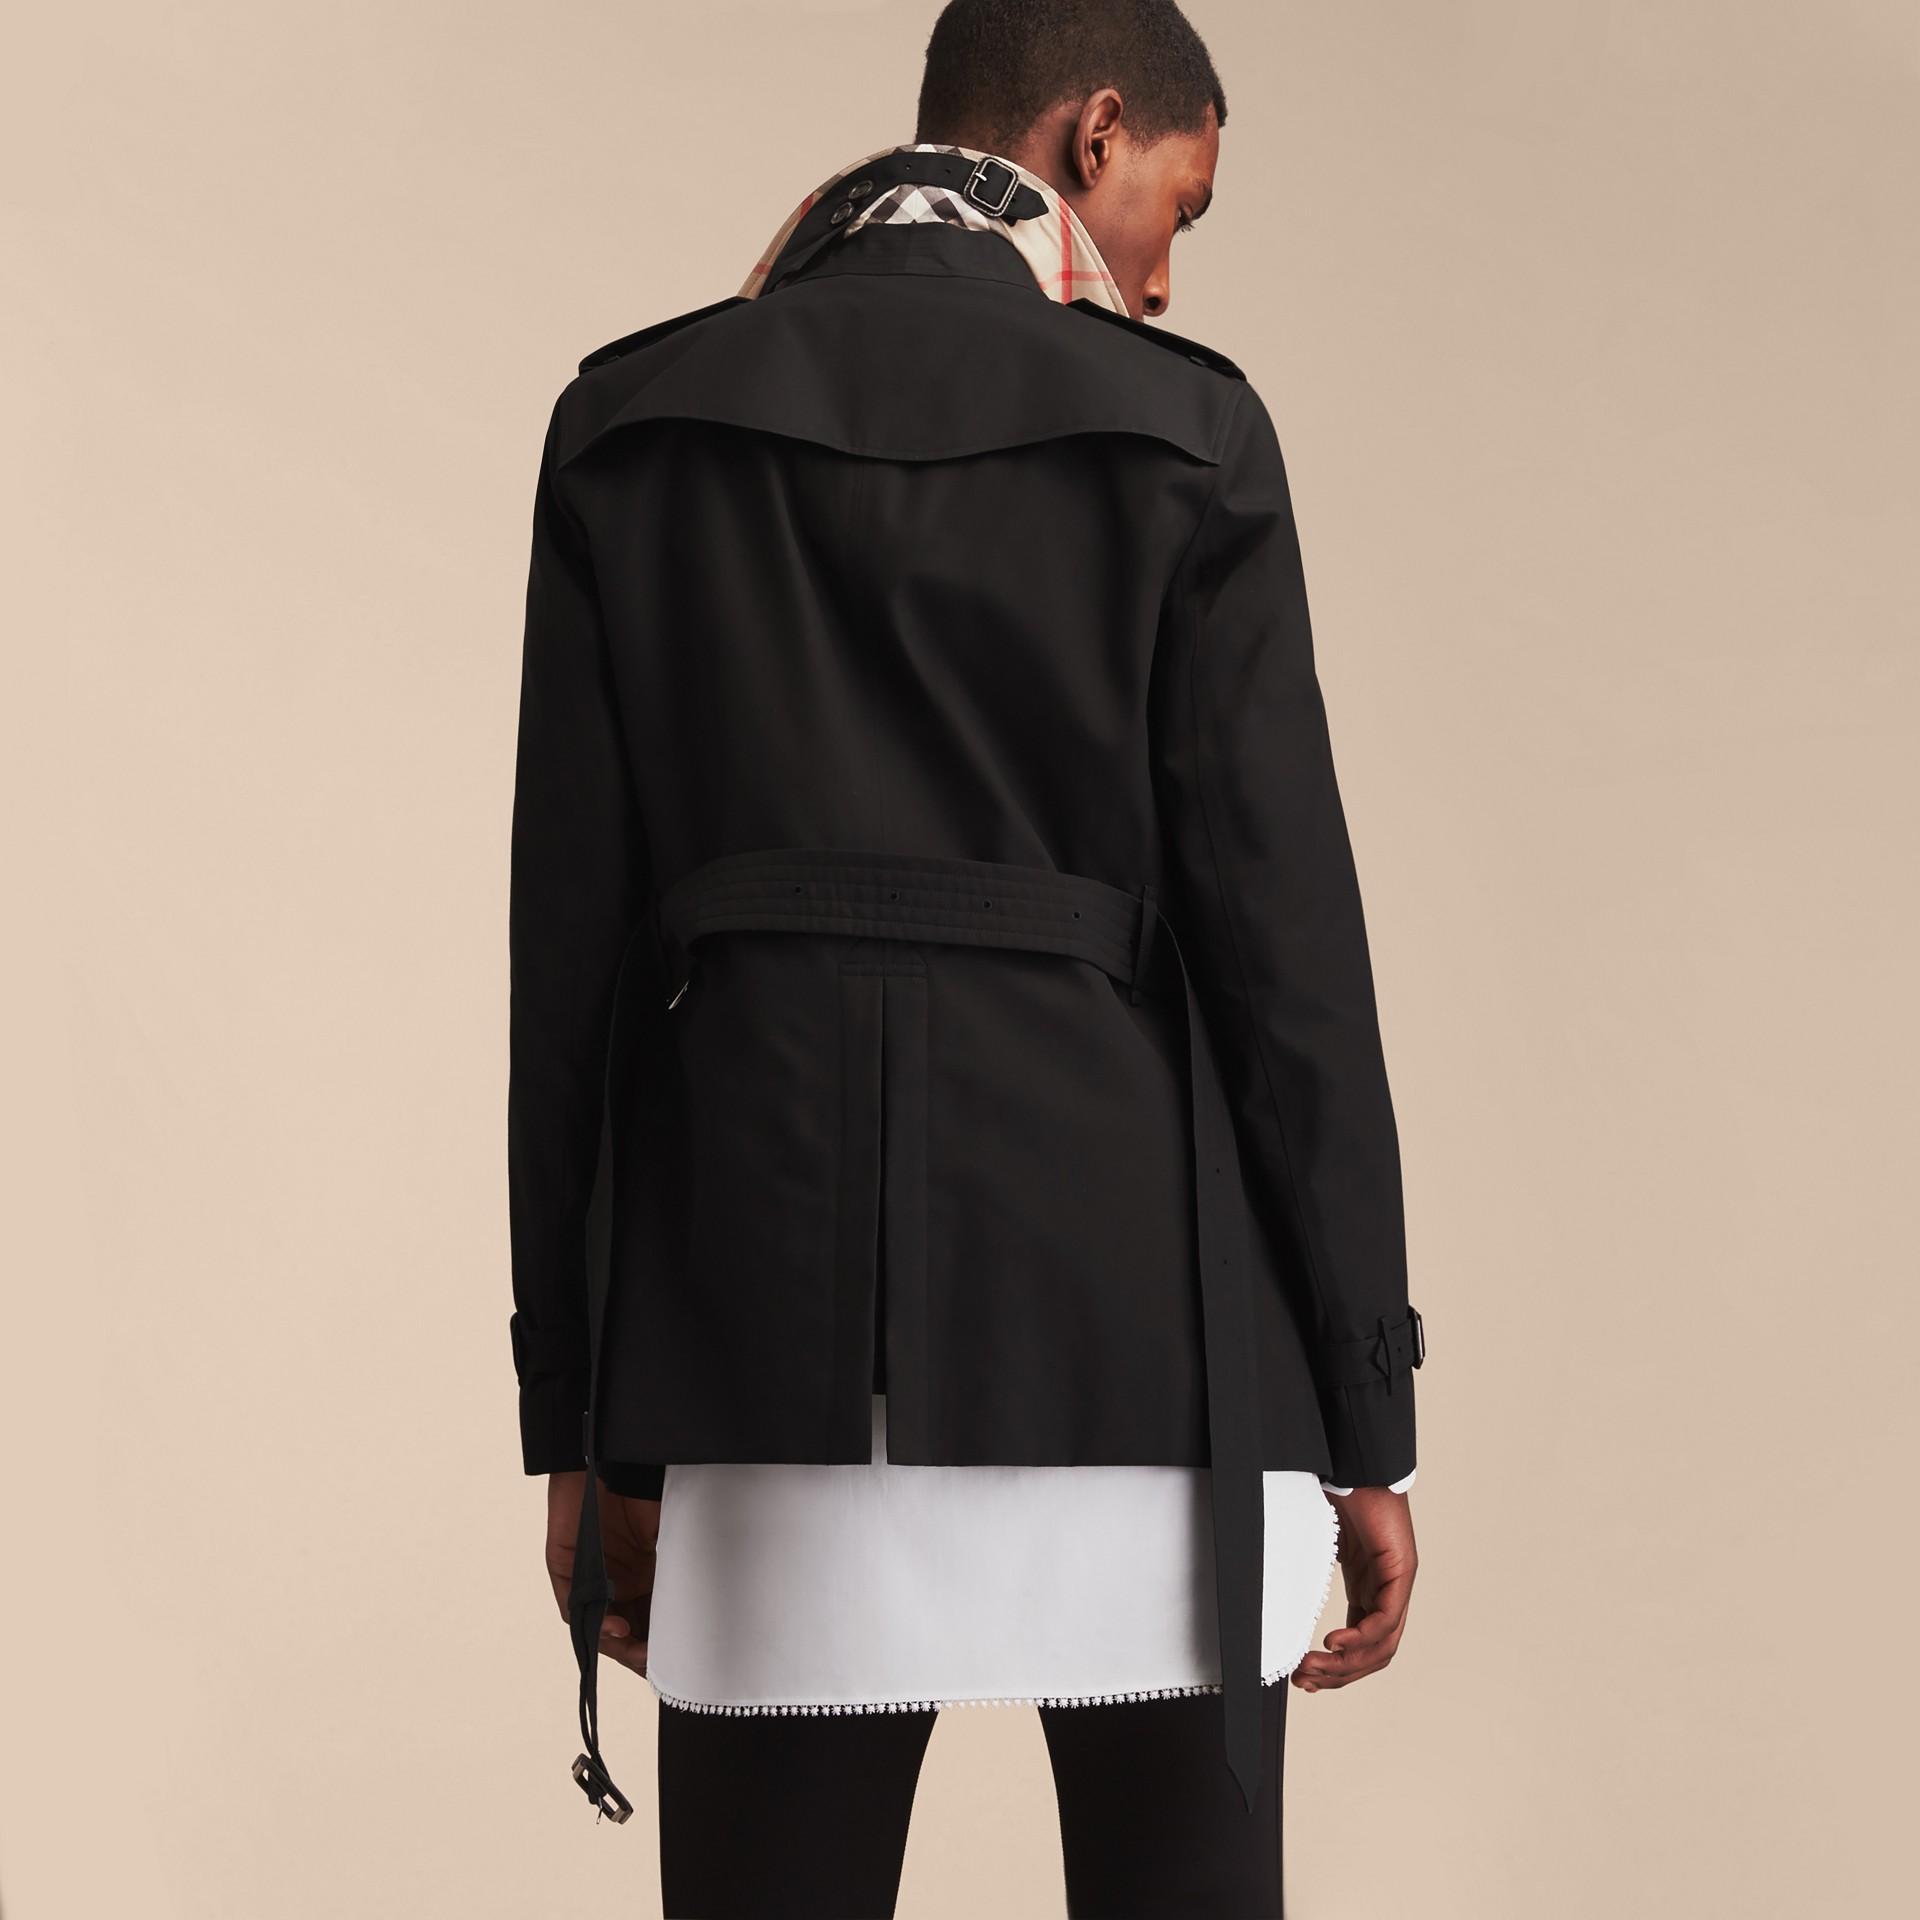 Negro Trench coat Chelsea – Trench coat Heritage corto Negro - imagen de la galería 4